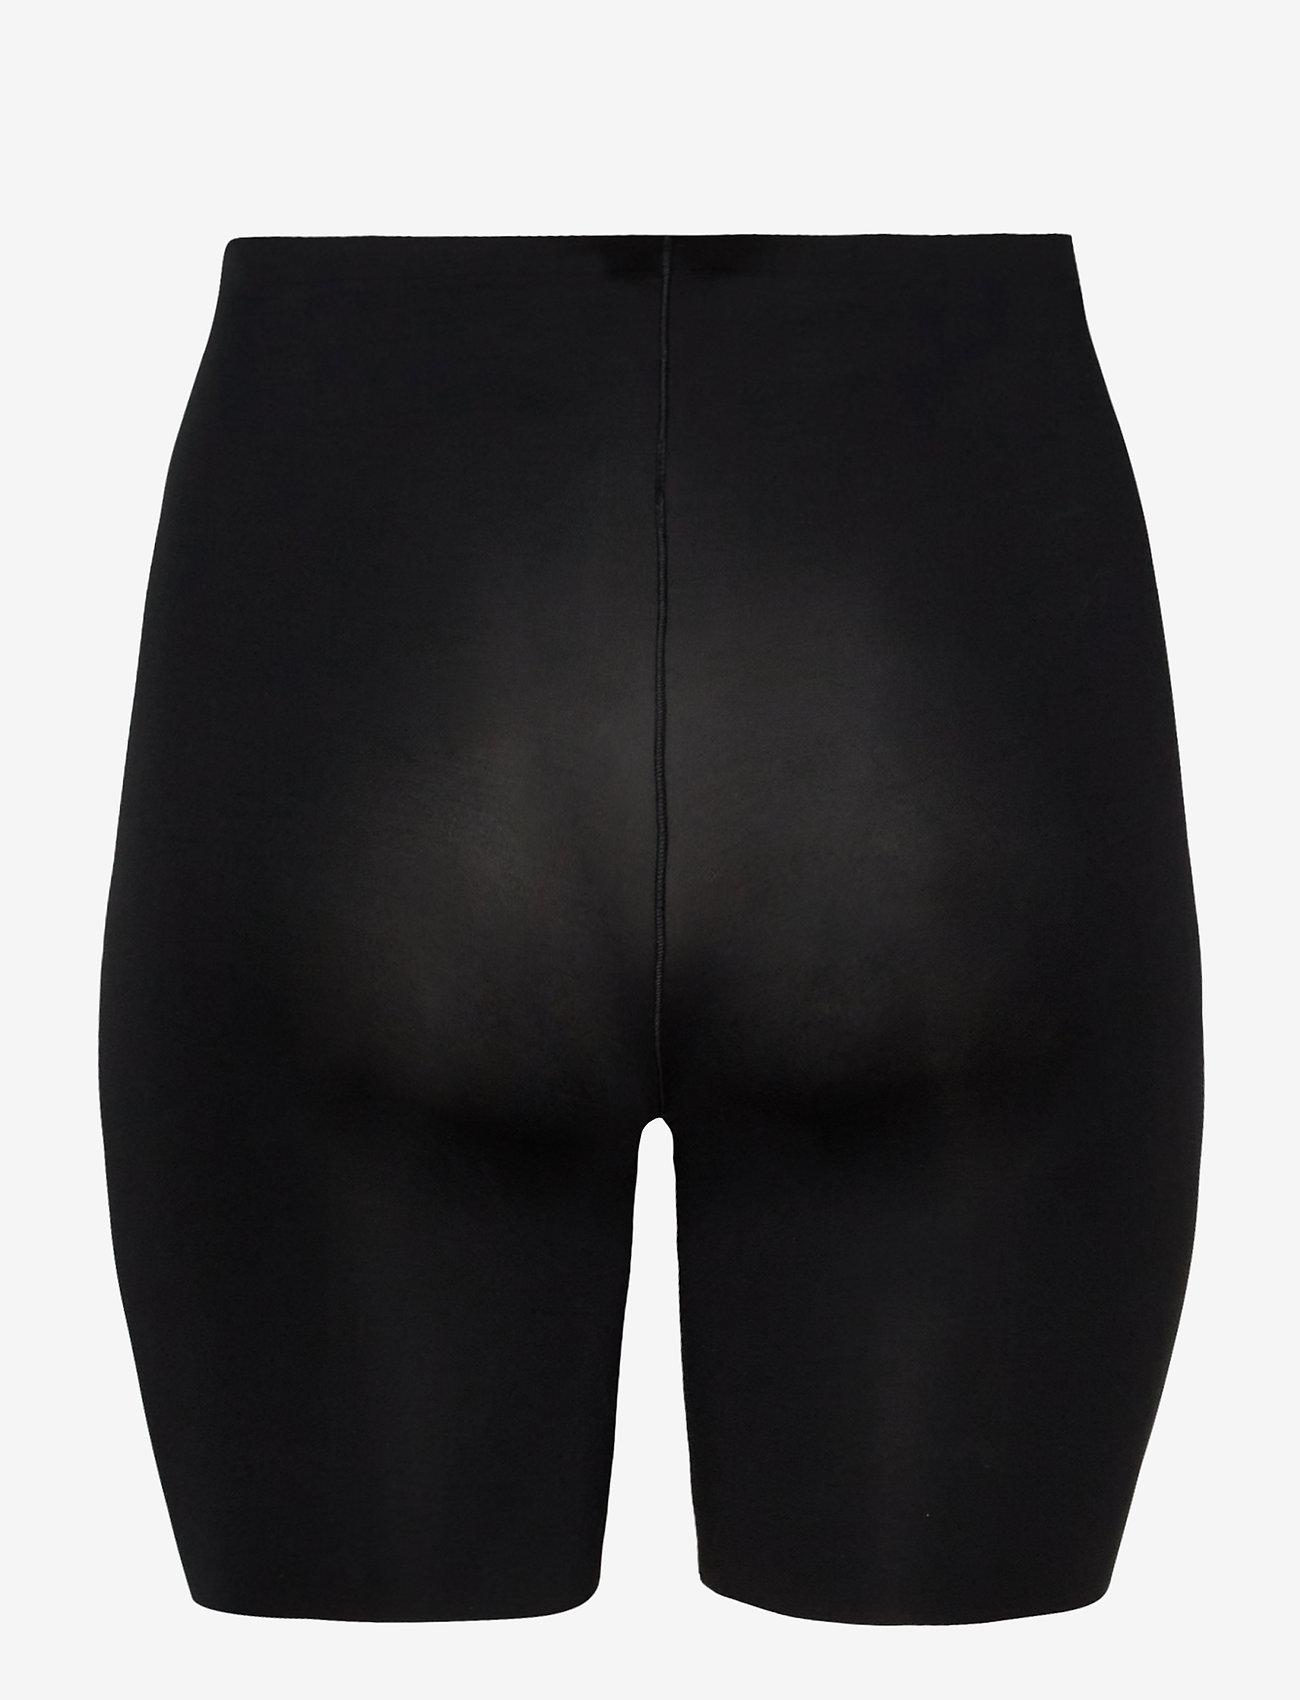 Spanx - SHORT - bottoms - very black - 1